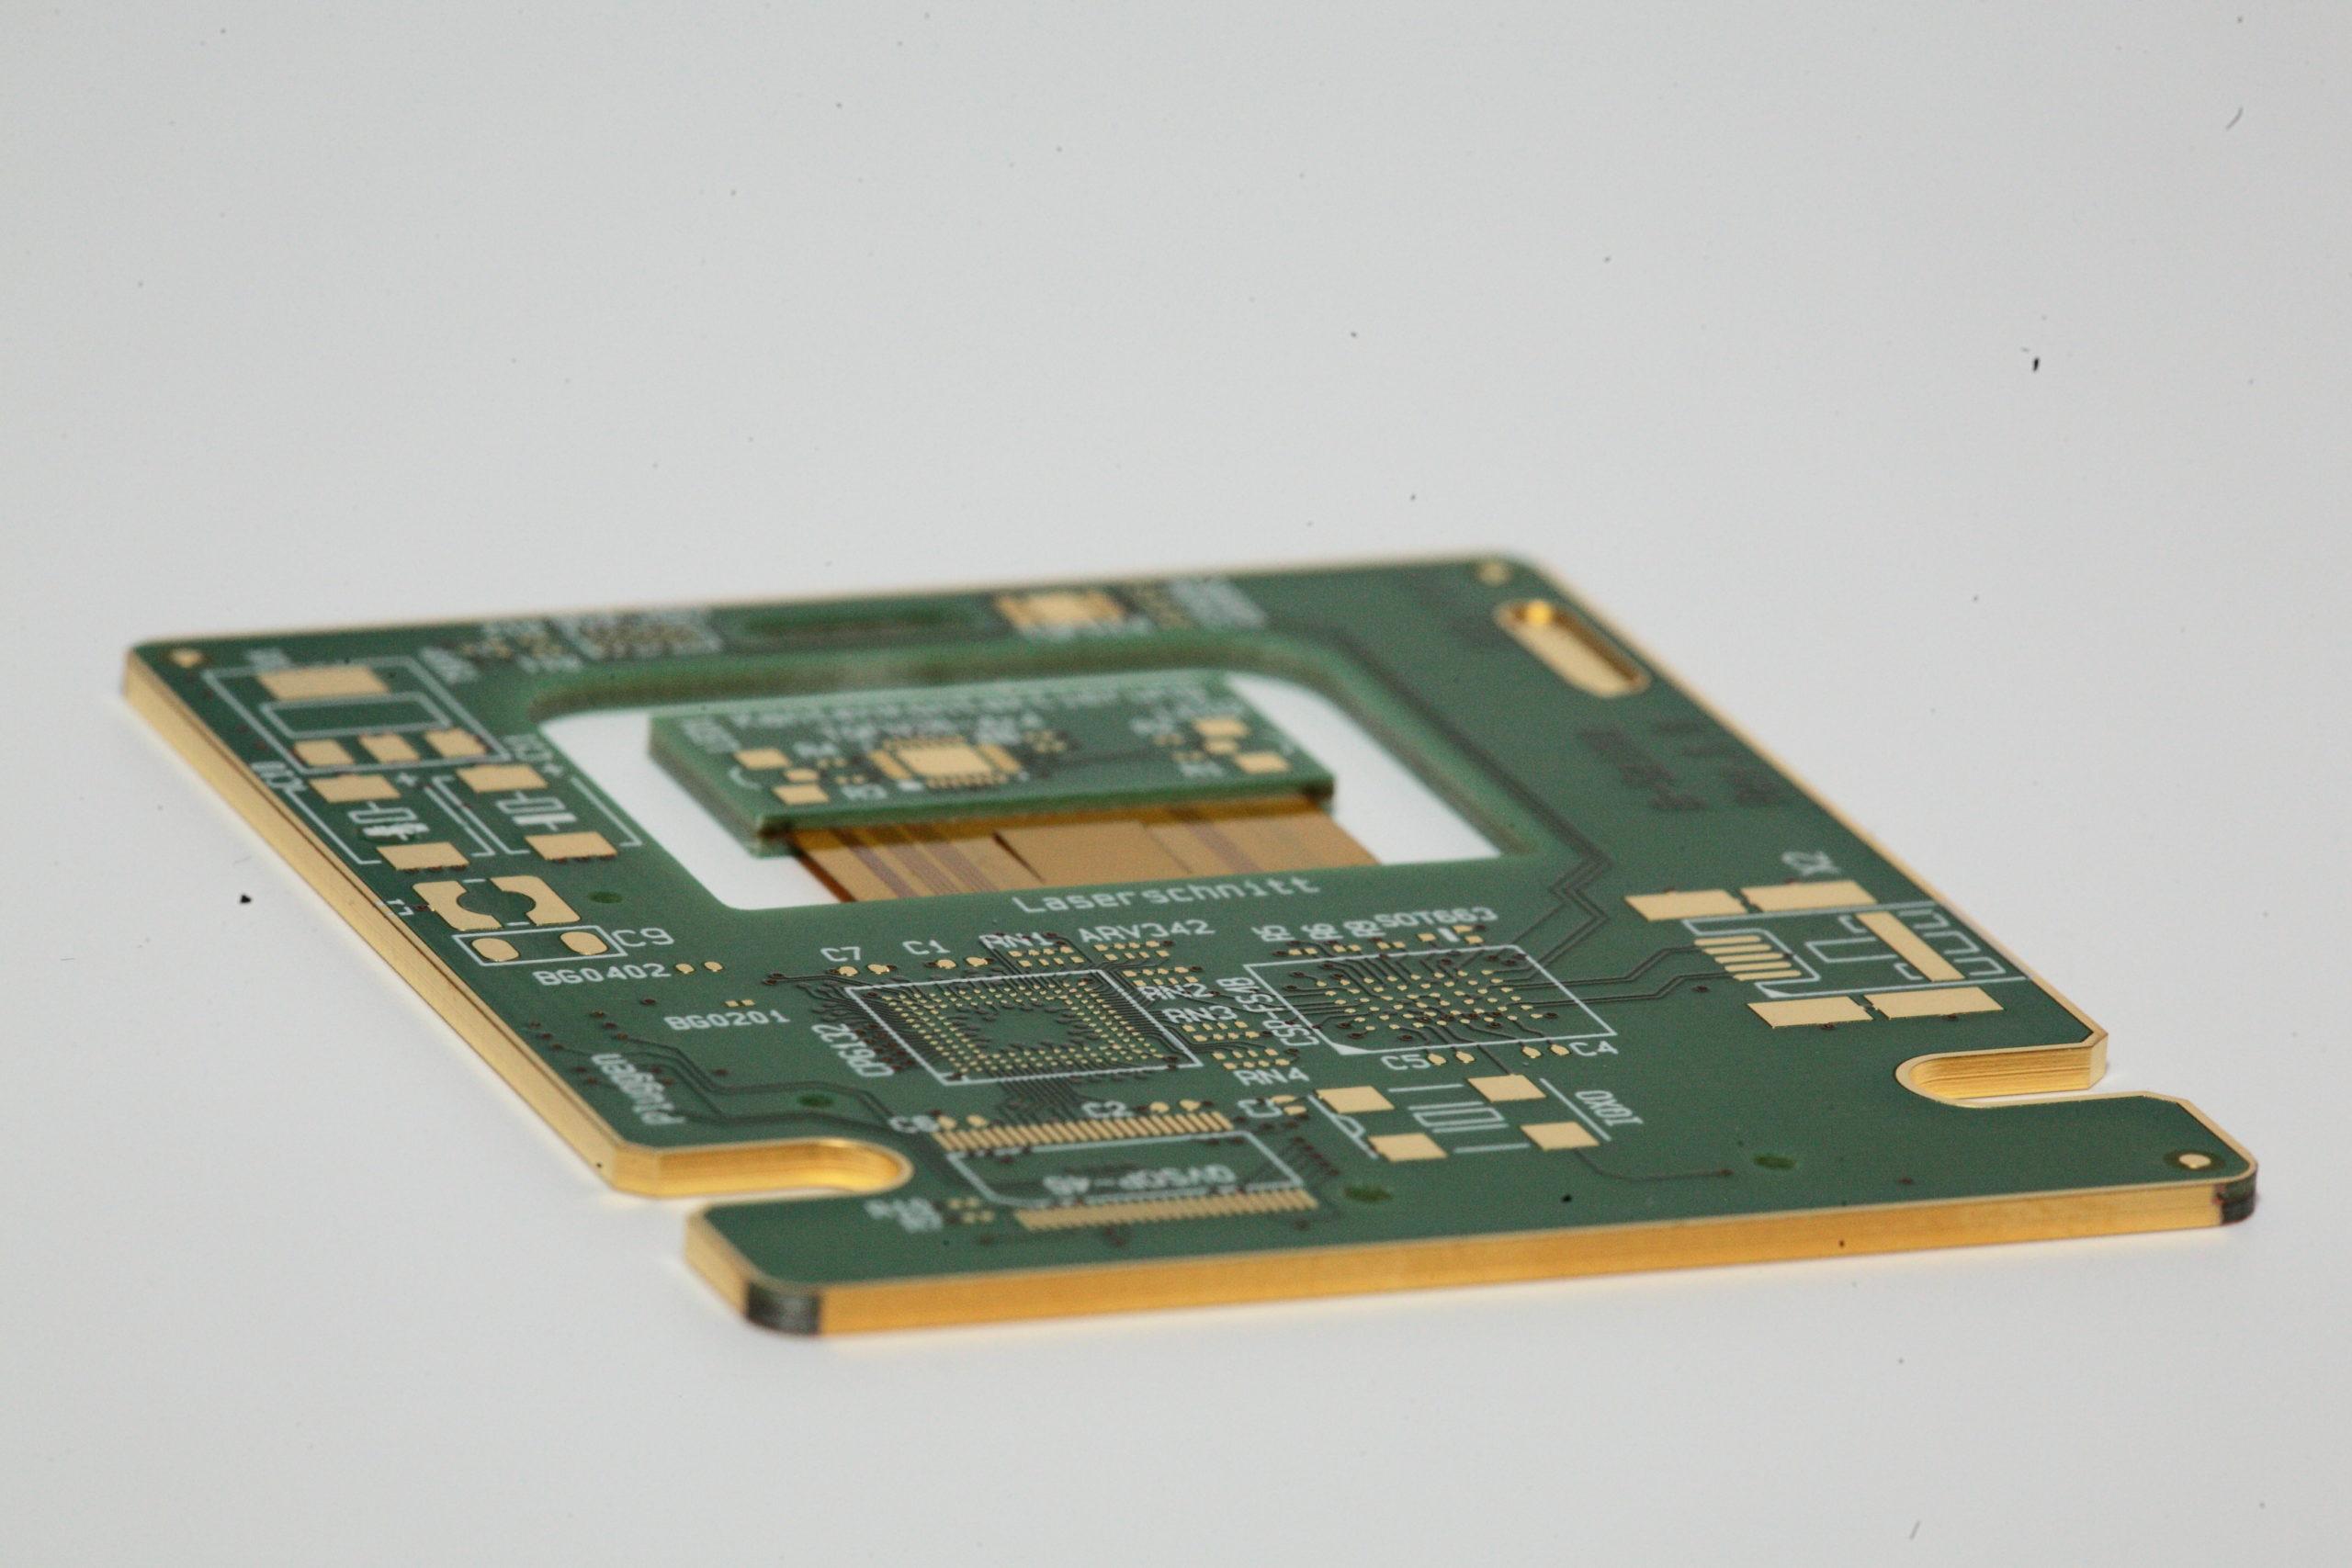 Rigid-flex printed circuit board with edge metallisation